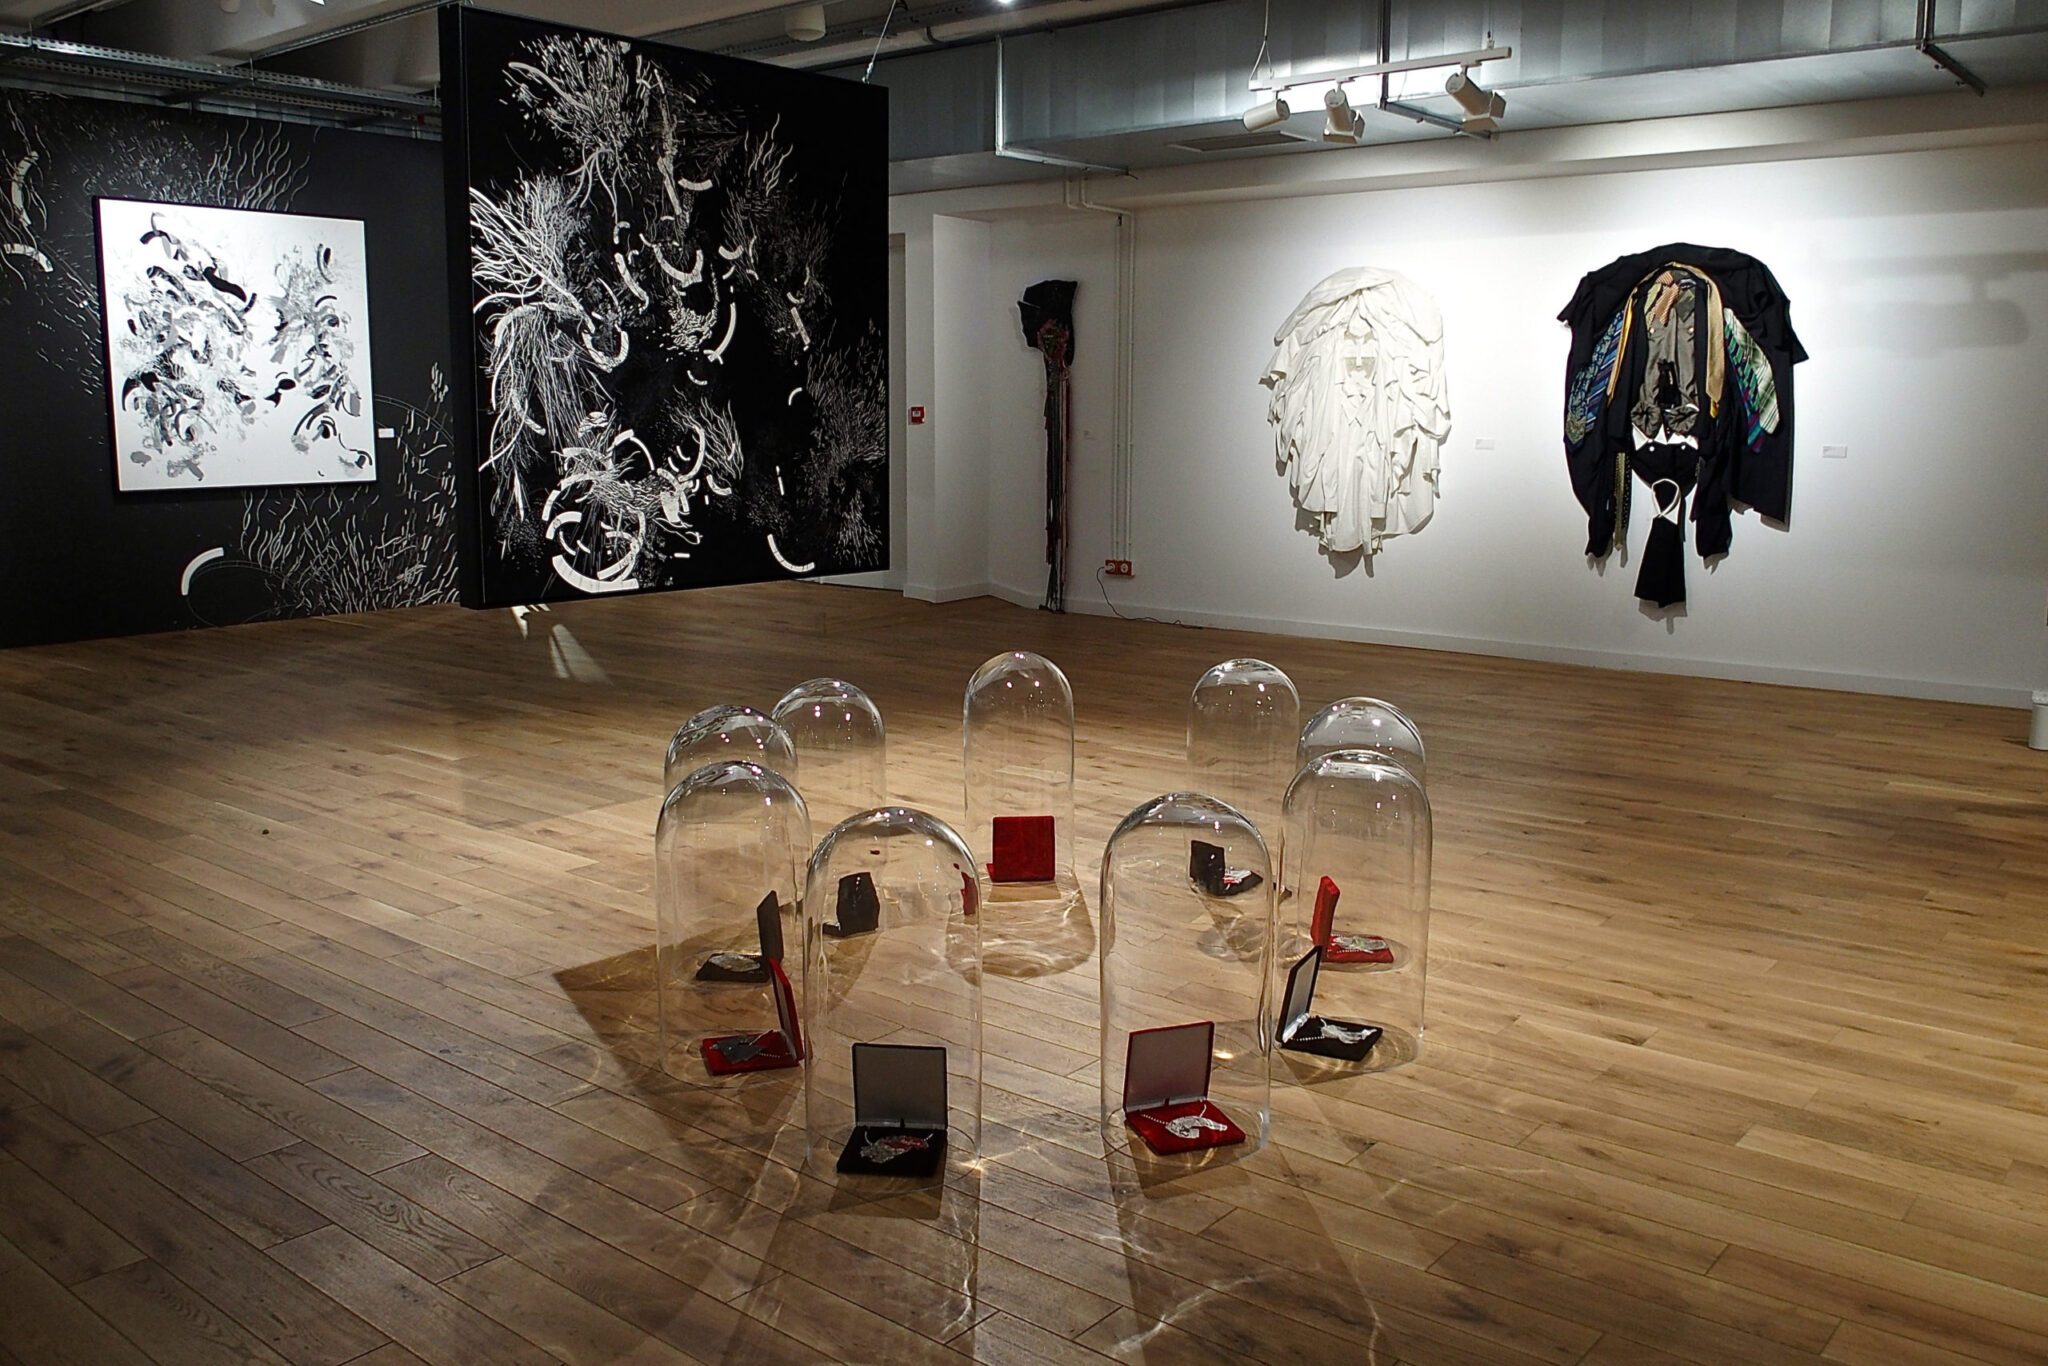 audrey-hatchikian-gallery-flagrant-délire-sacha-haillote-rodolphe-barsikian-expo-contemporary-art-3